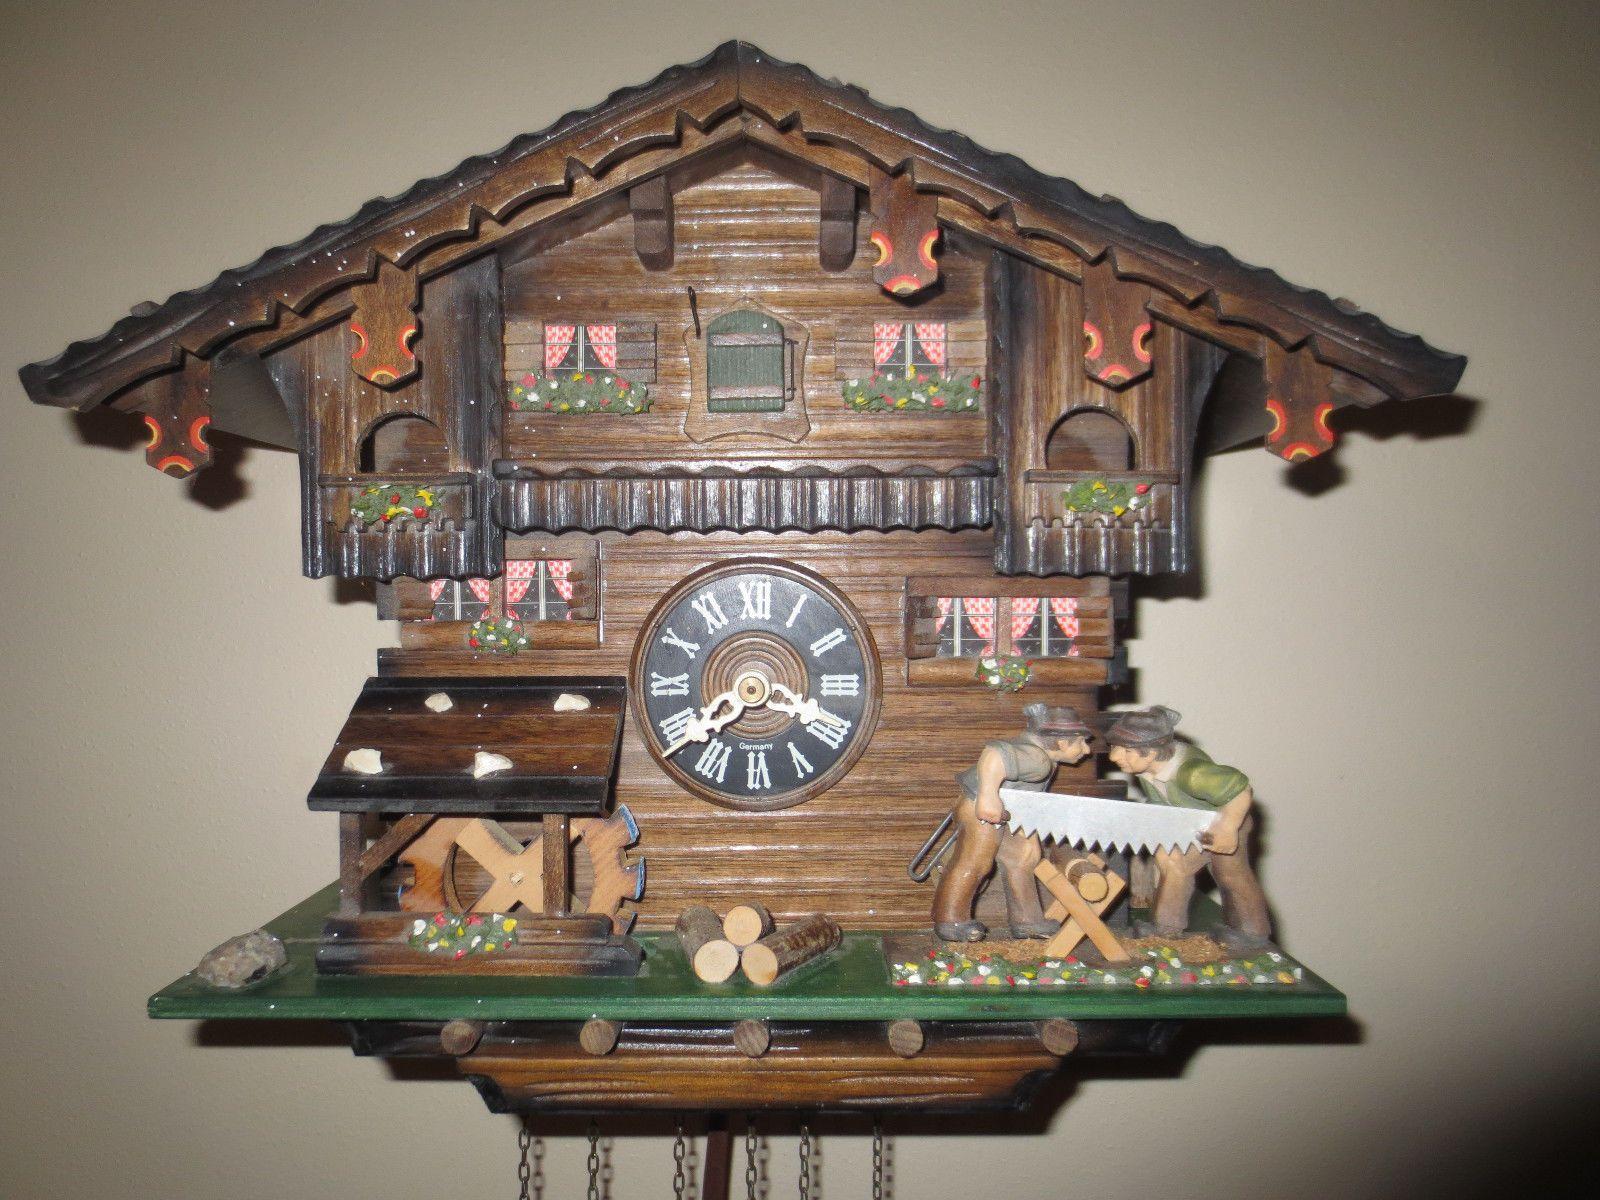 Hones German Chalet 1 Day Musical Cuckoo Clock Waterwheel Saw Men Black Forest Ebay Clock Cuckoo Clock Black Forest